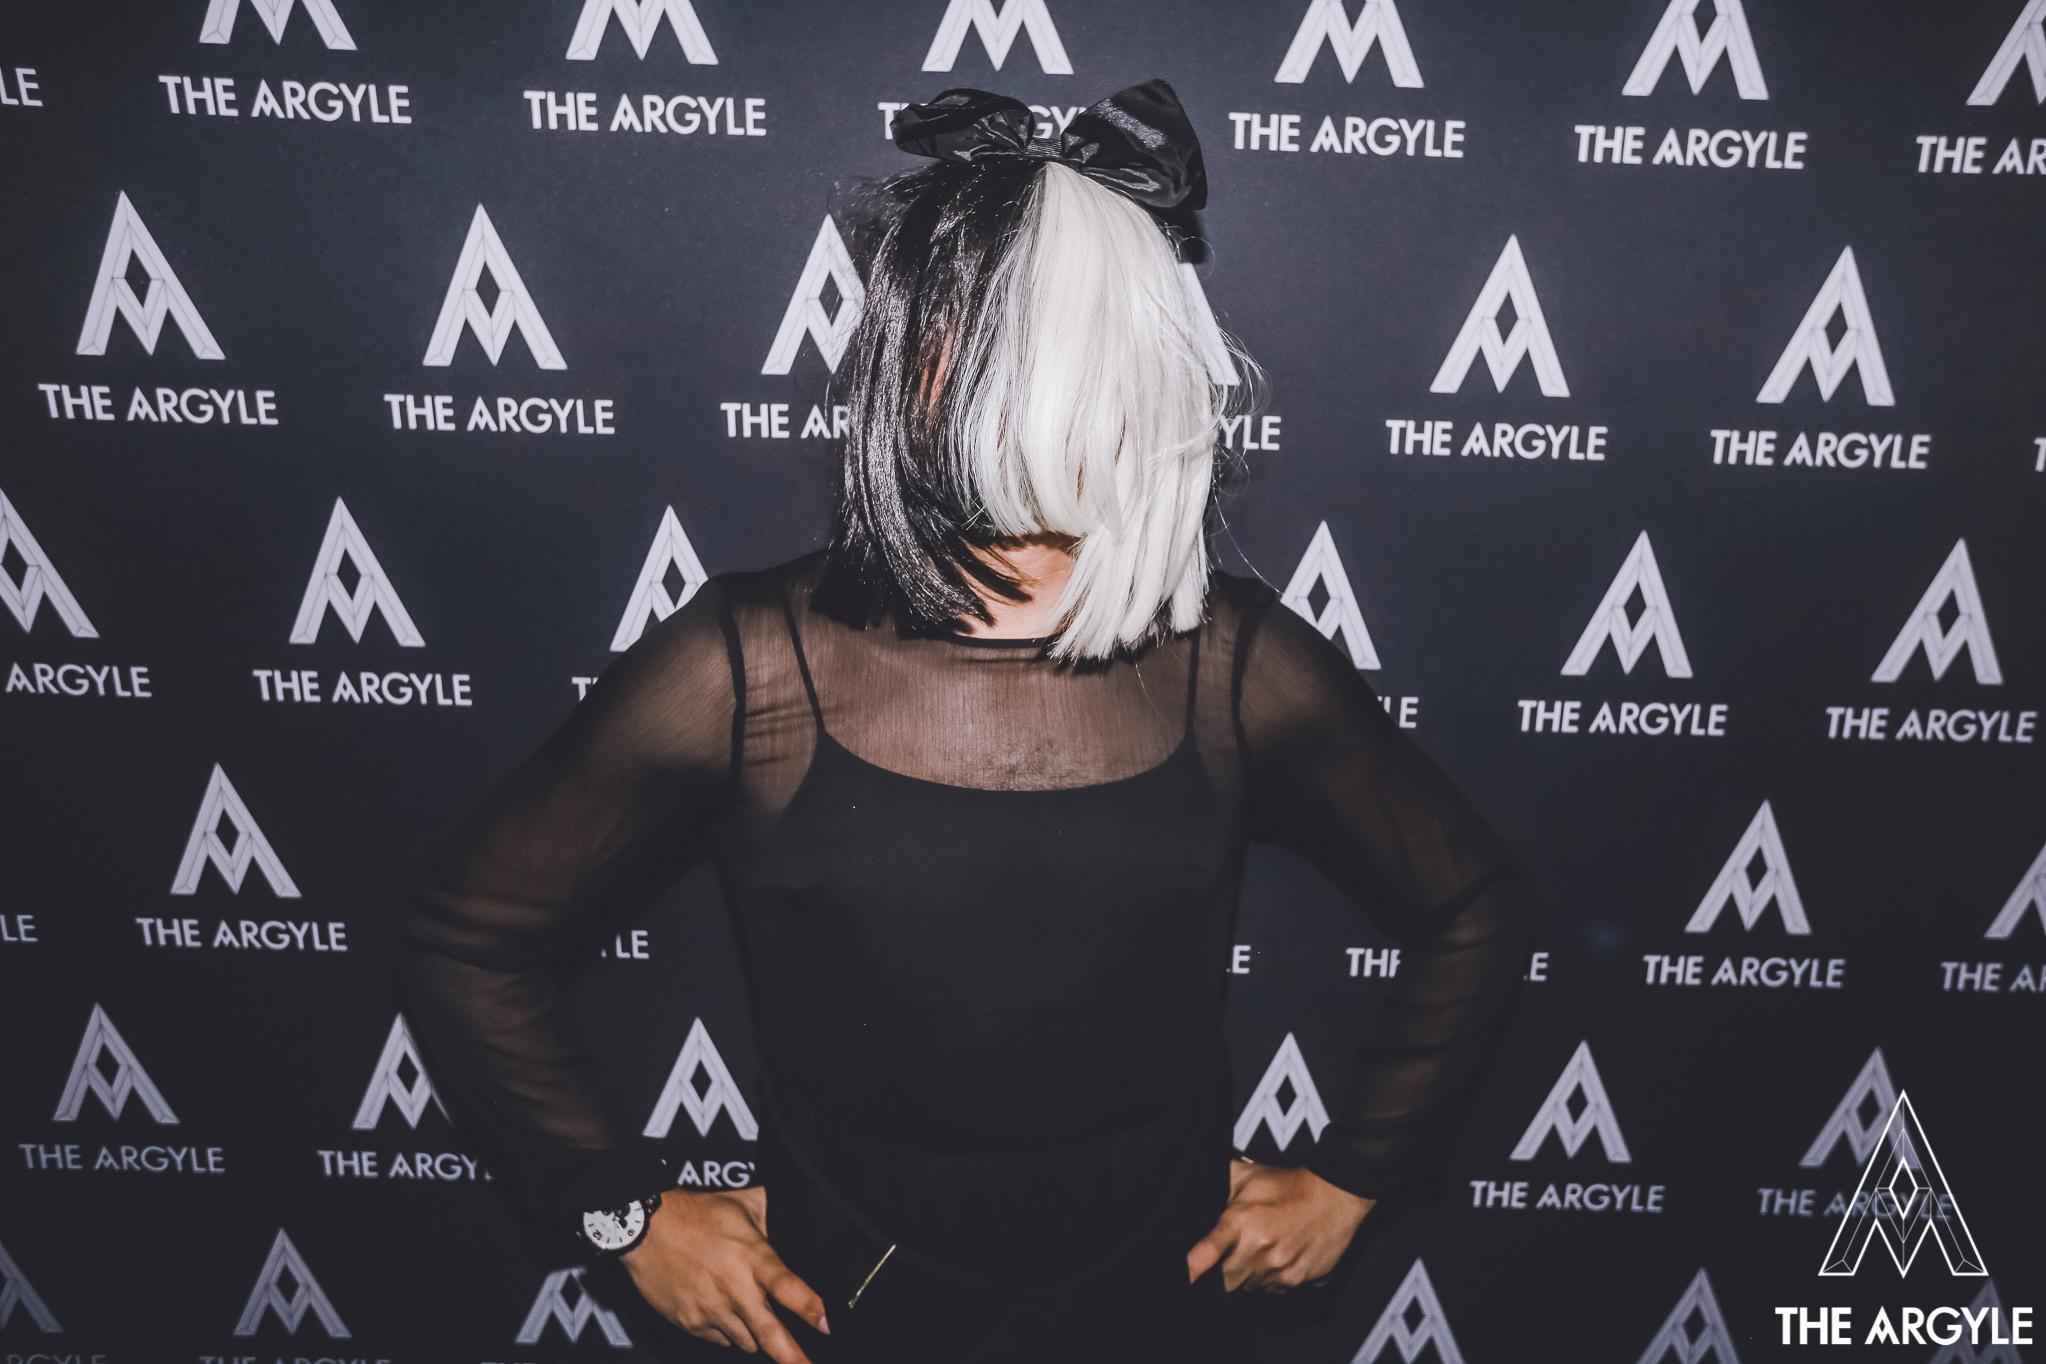 the-argyle-28th-of-oct-2016-dans-85